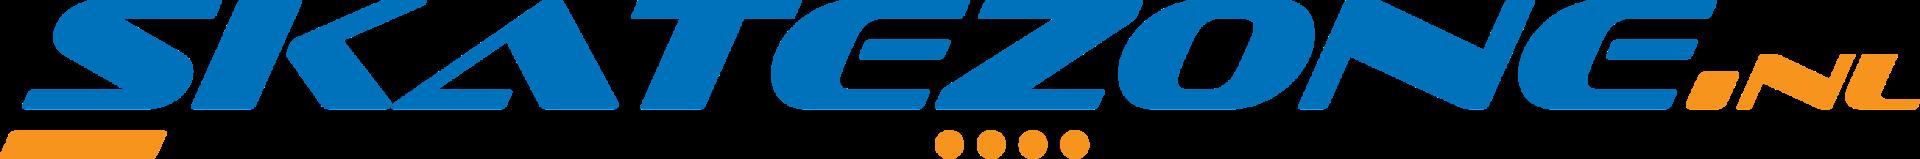 Skatezone logo